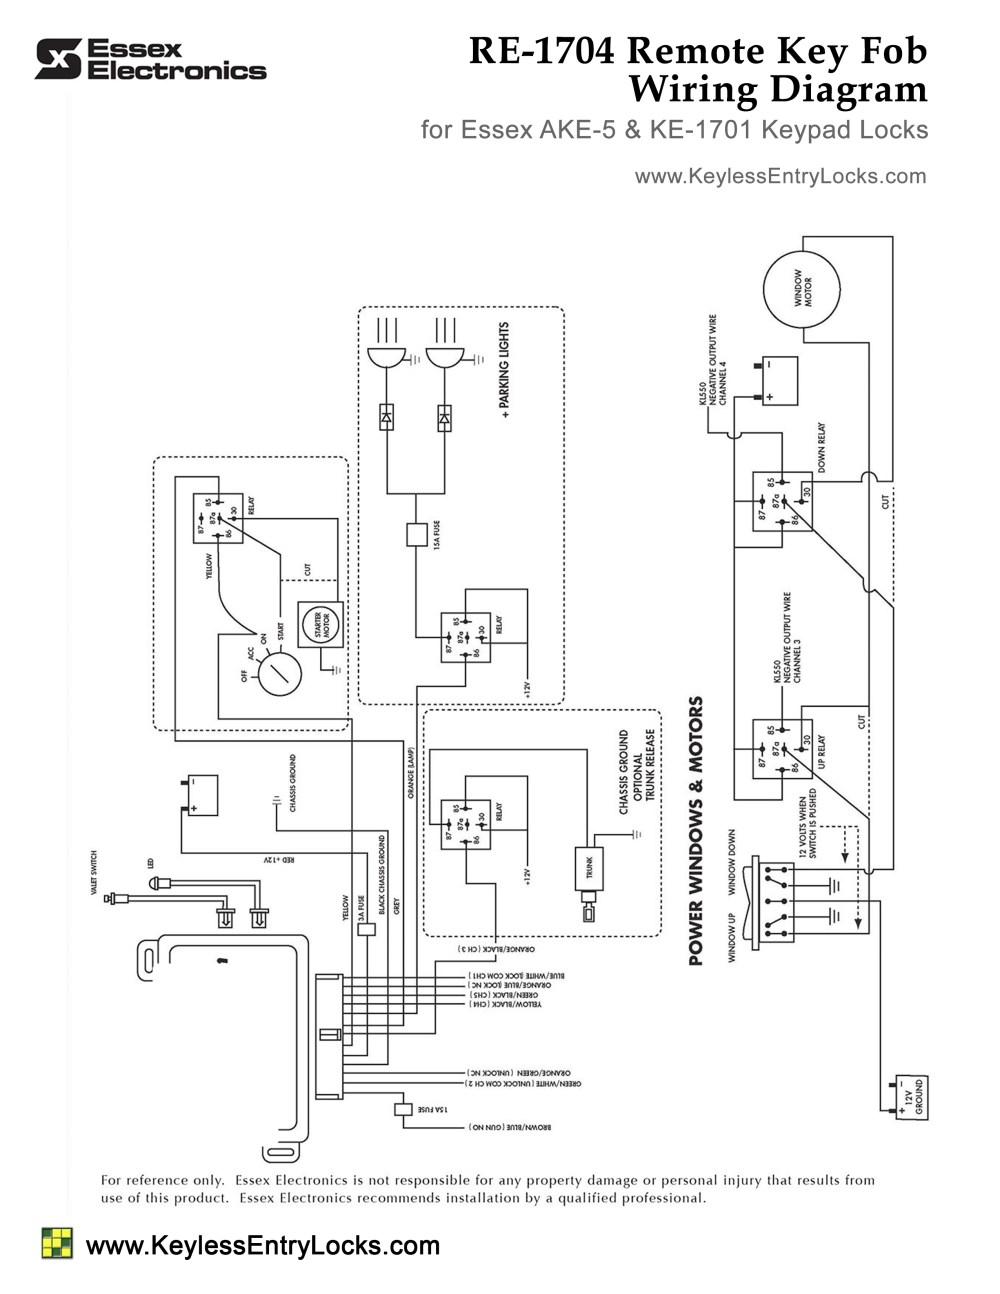 medium resolution of essex wiring diagram wiring diagramessex wiring diagram wiring diagramessex wiring diagram wiring diagram repair guidesessex key